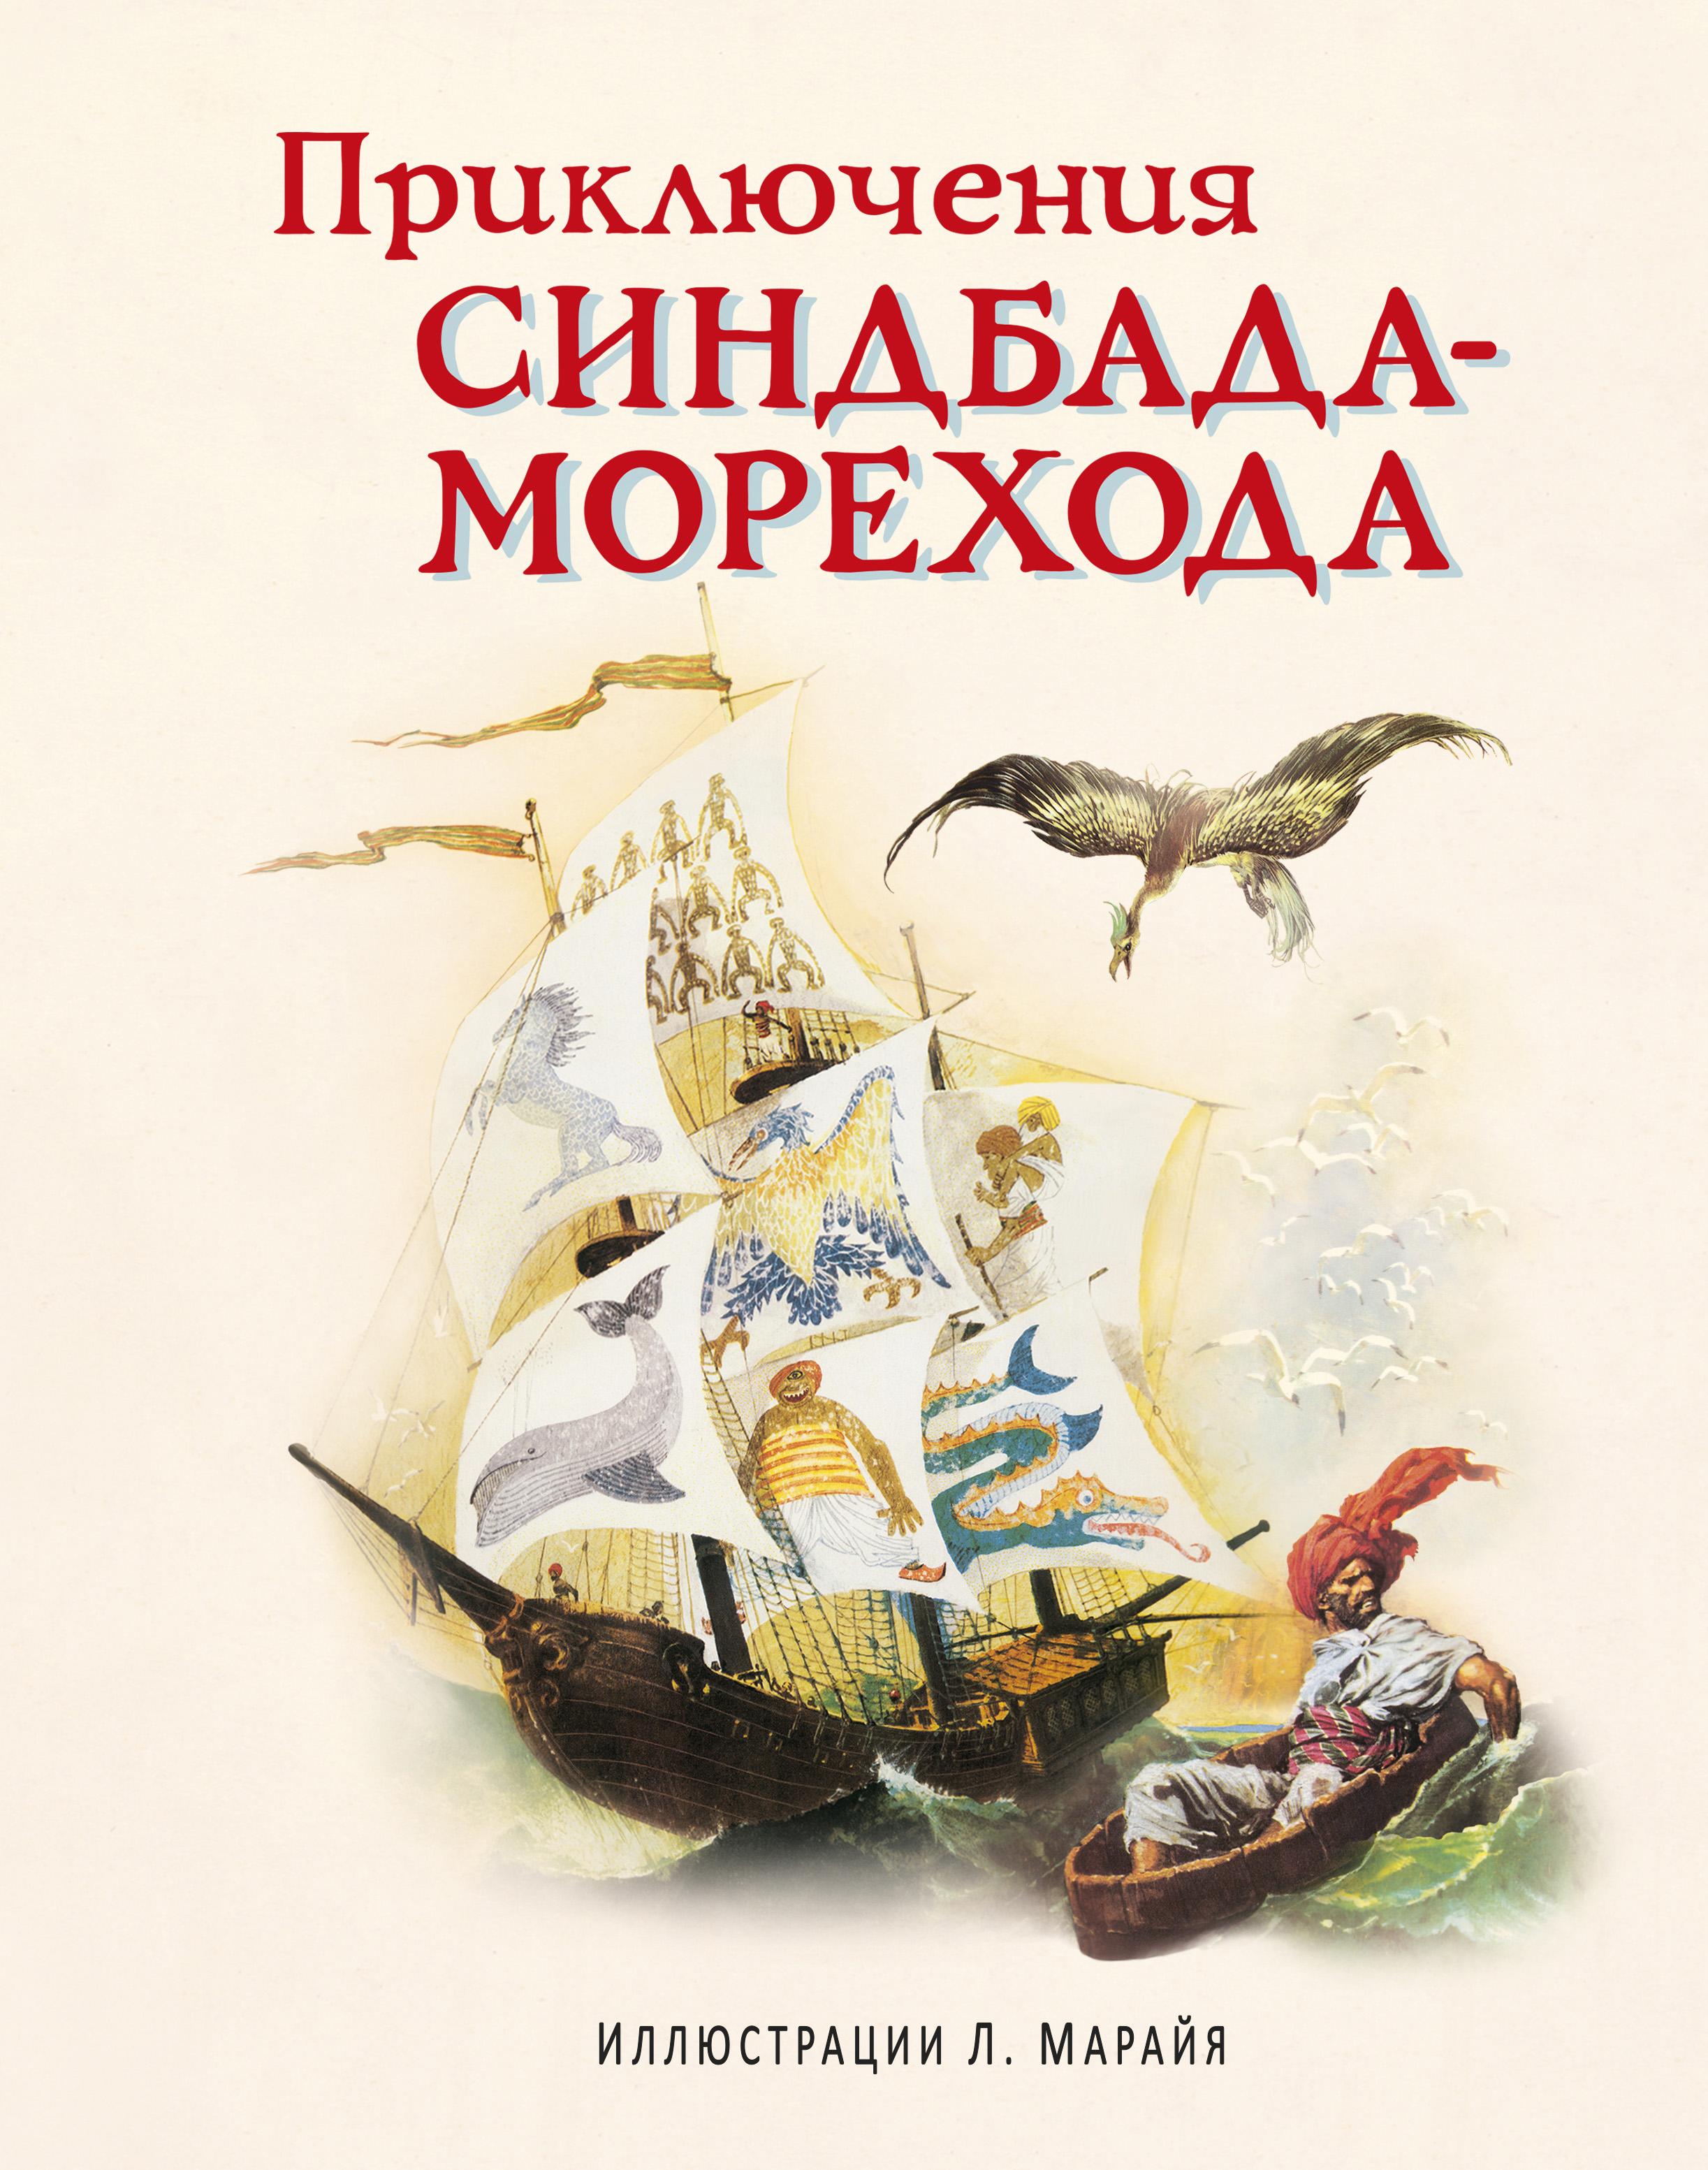 Народное творчество Приключения Синдбада-морехода